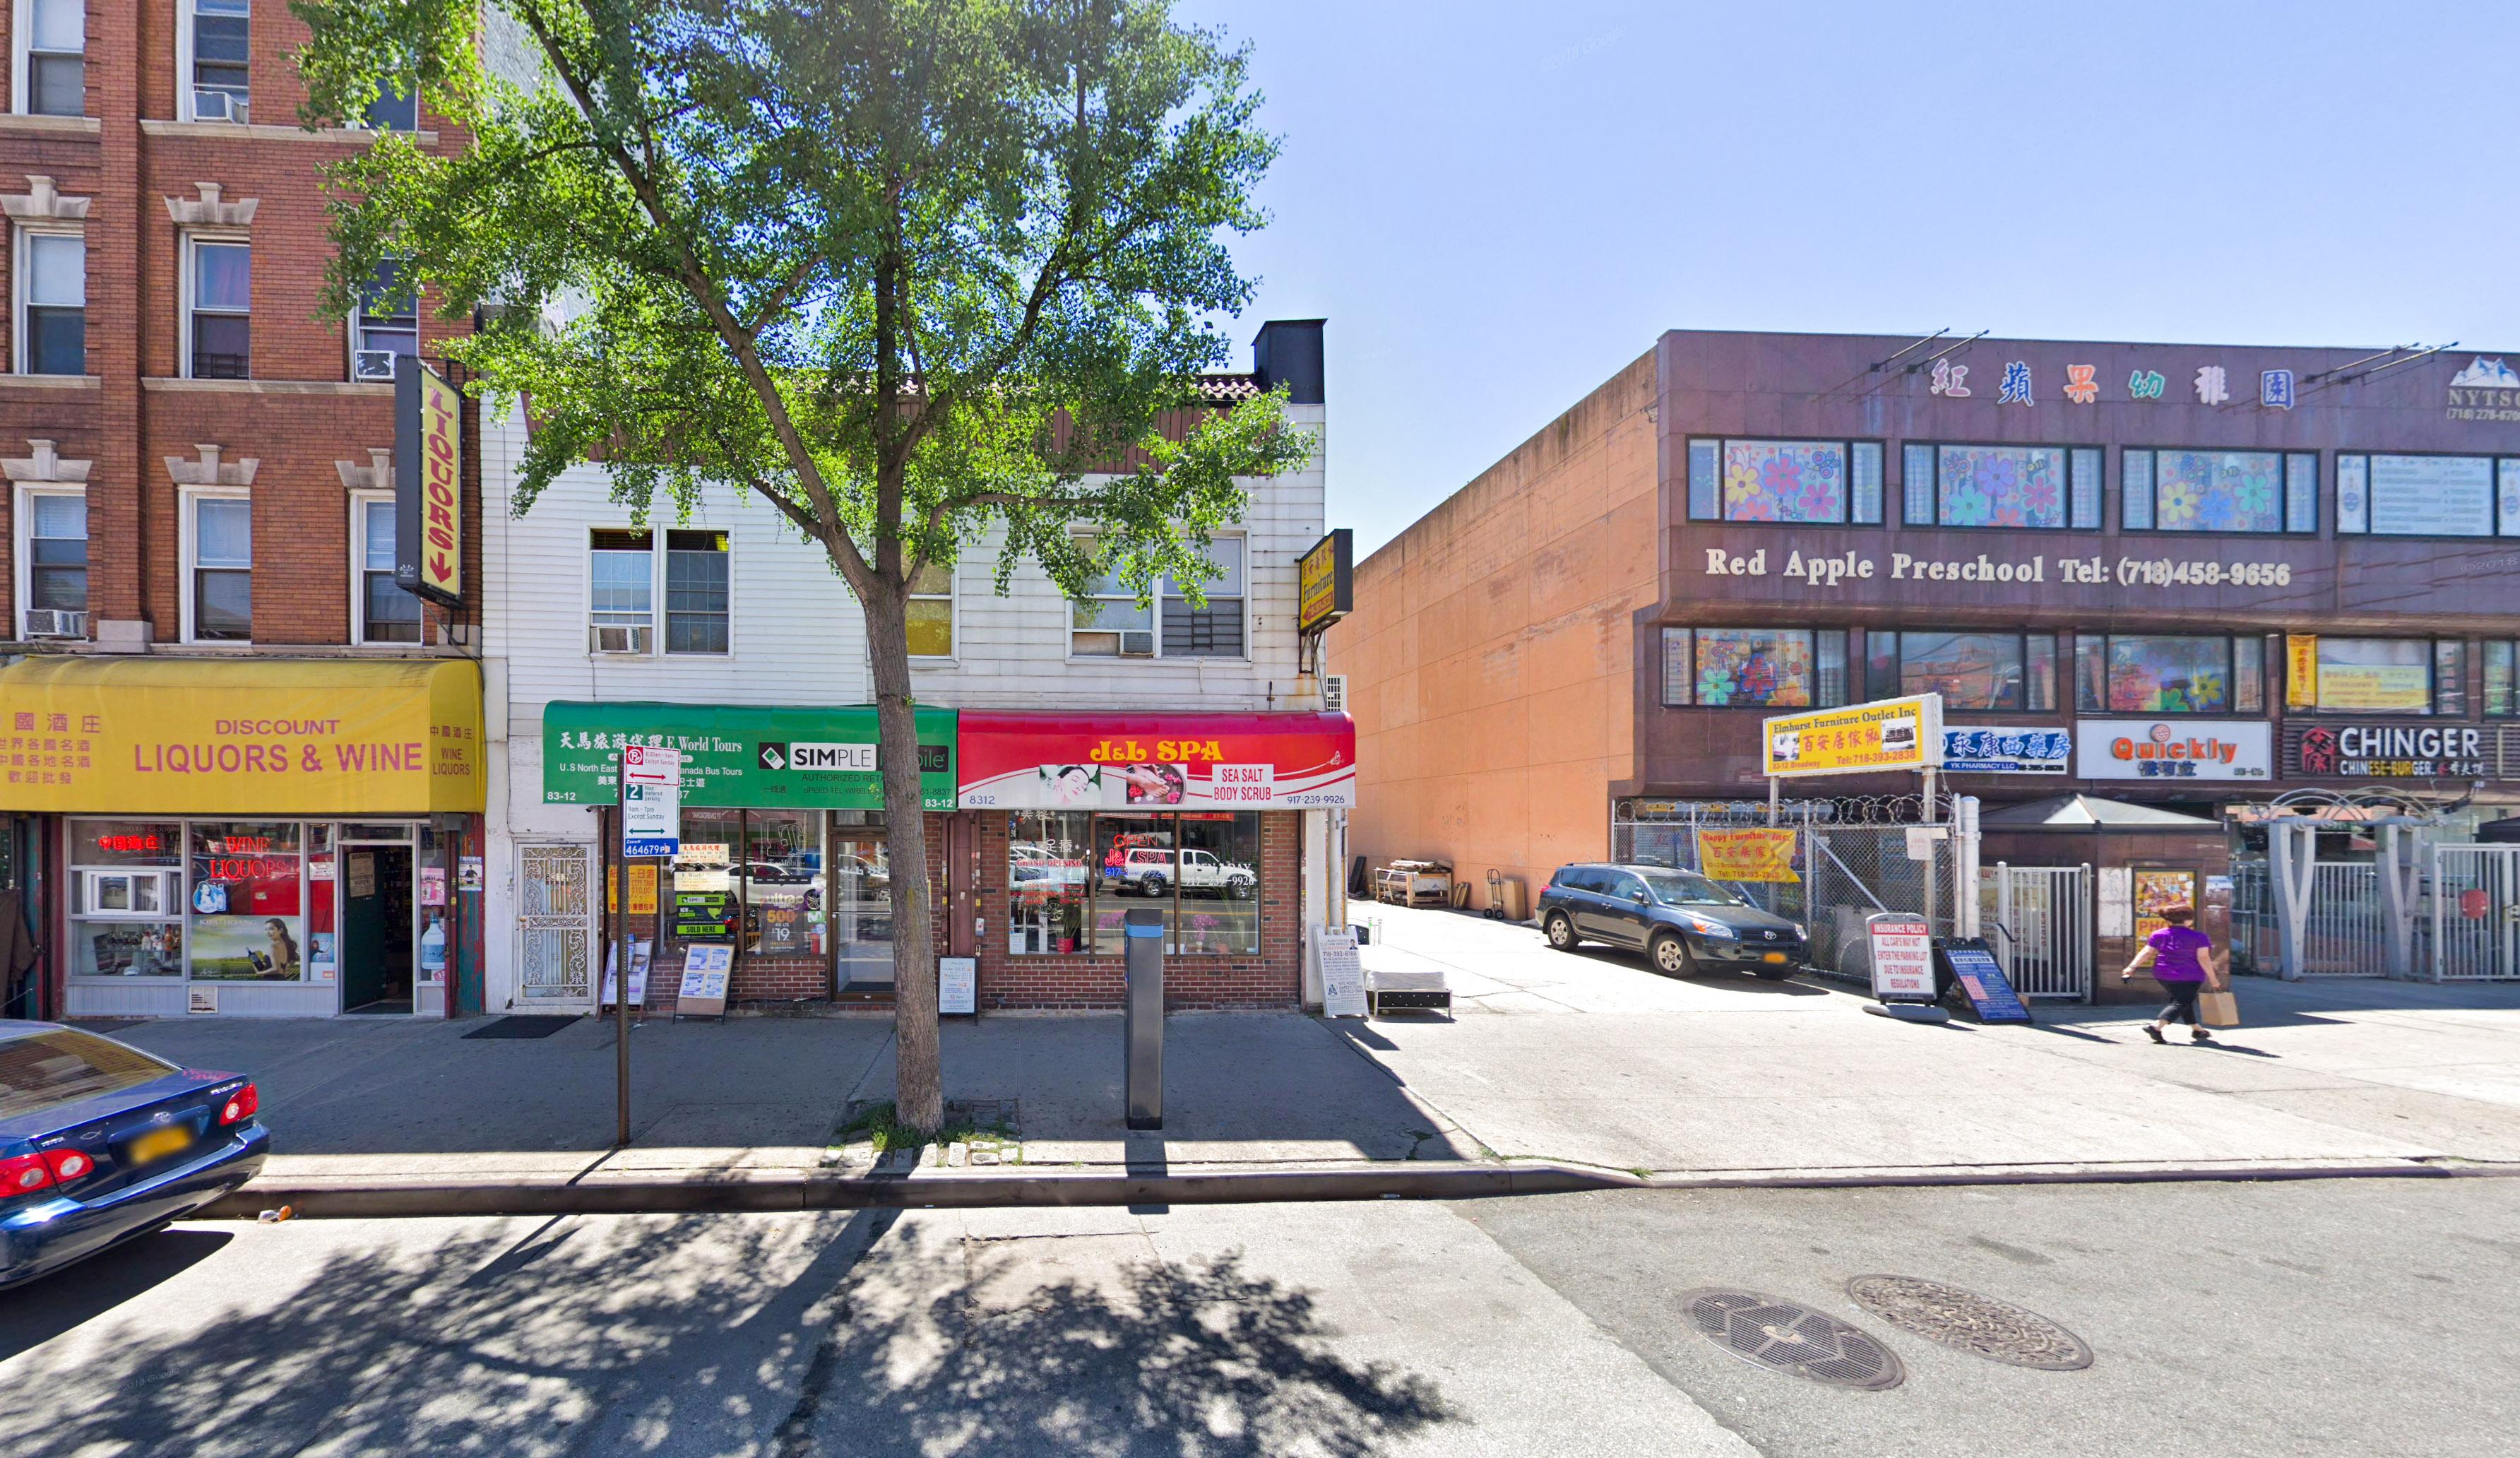 83-12 Broadway, via Google Maps